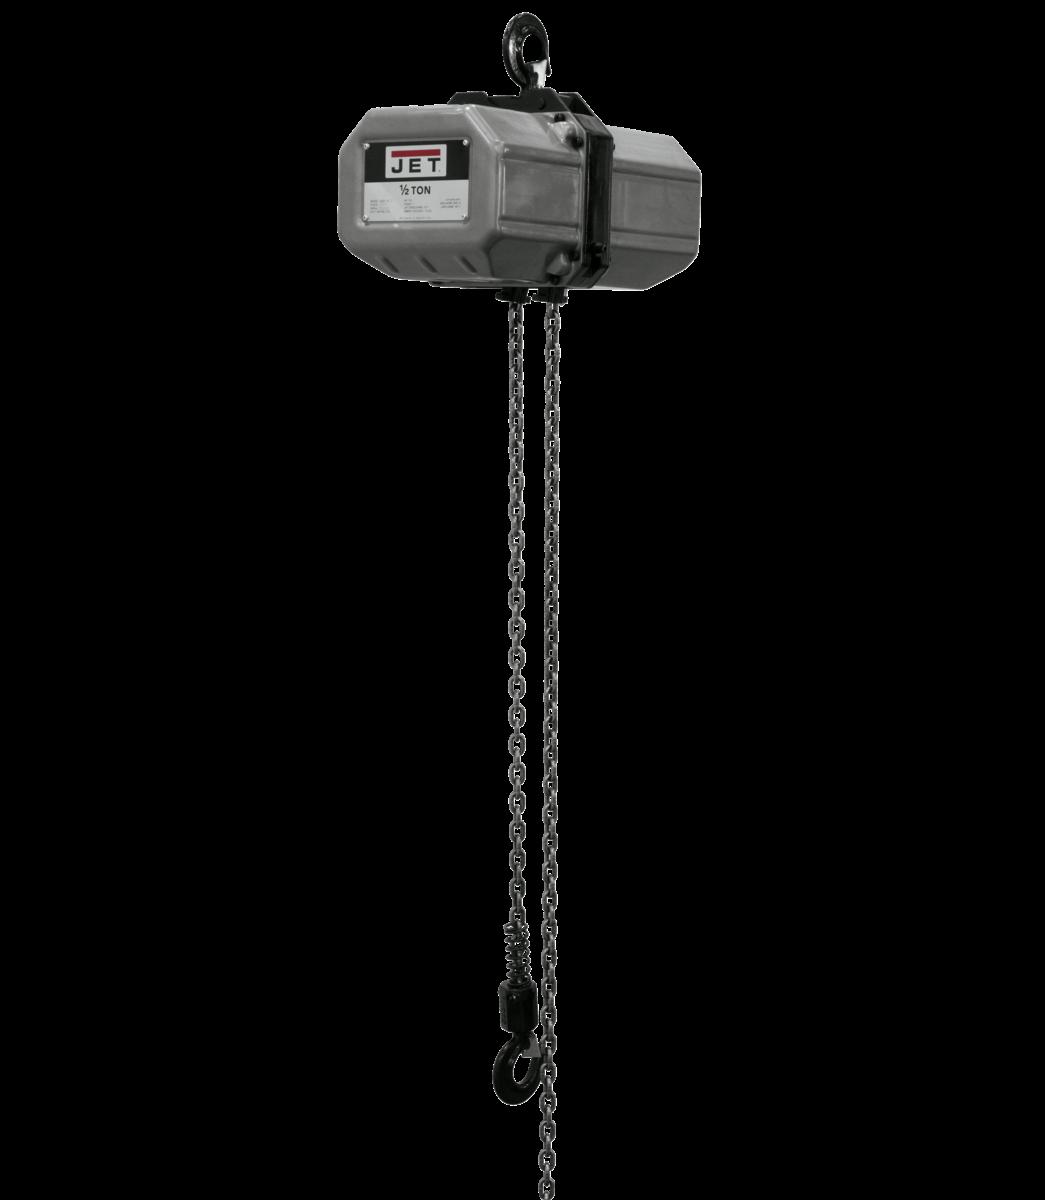 1/2SS-1C-10, 1/2-Ton Electric Chain Hoist 1-Phase 10' Lift